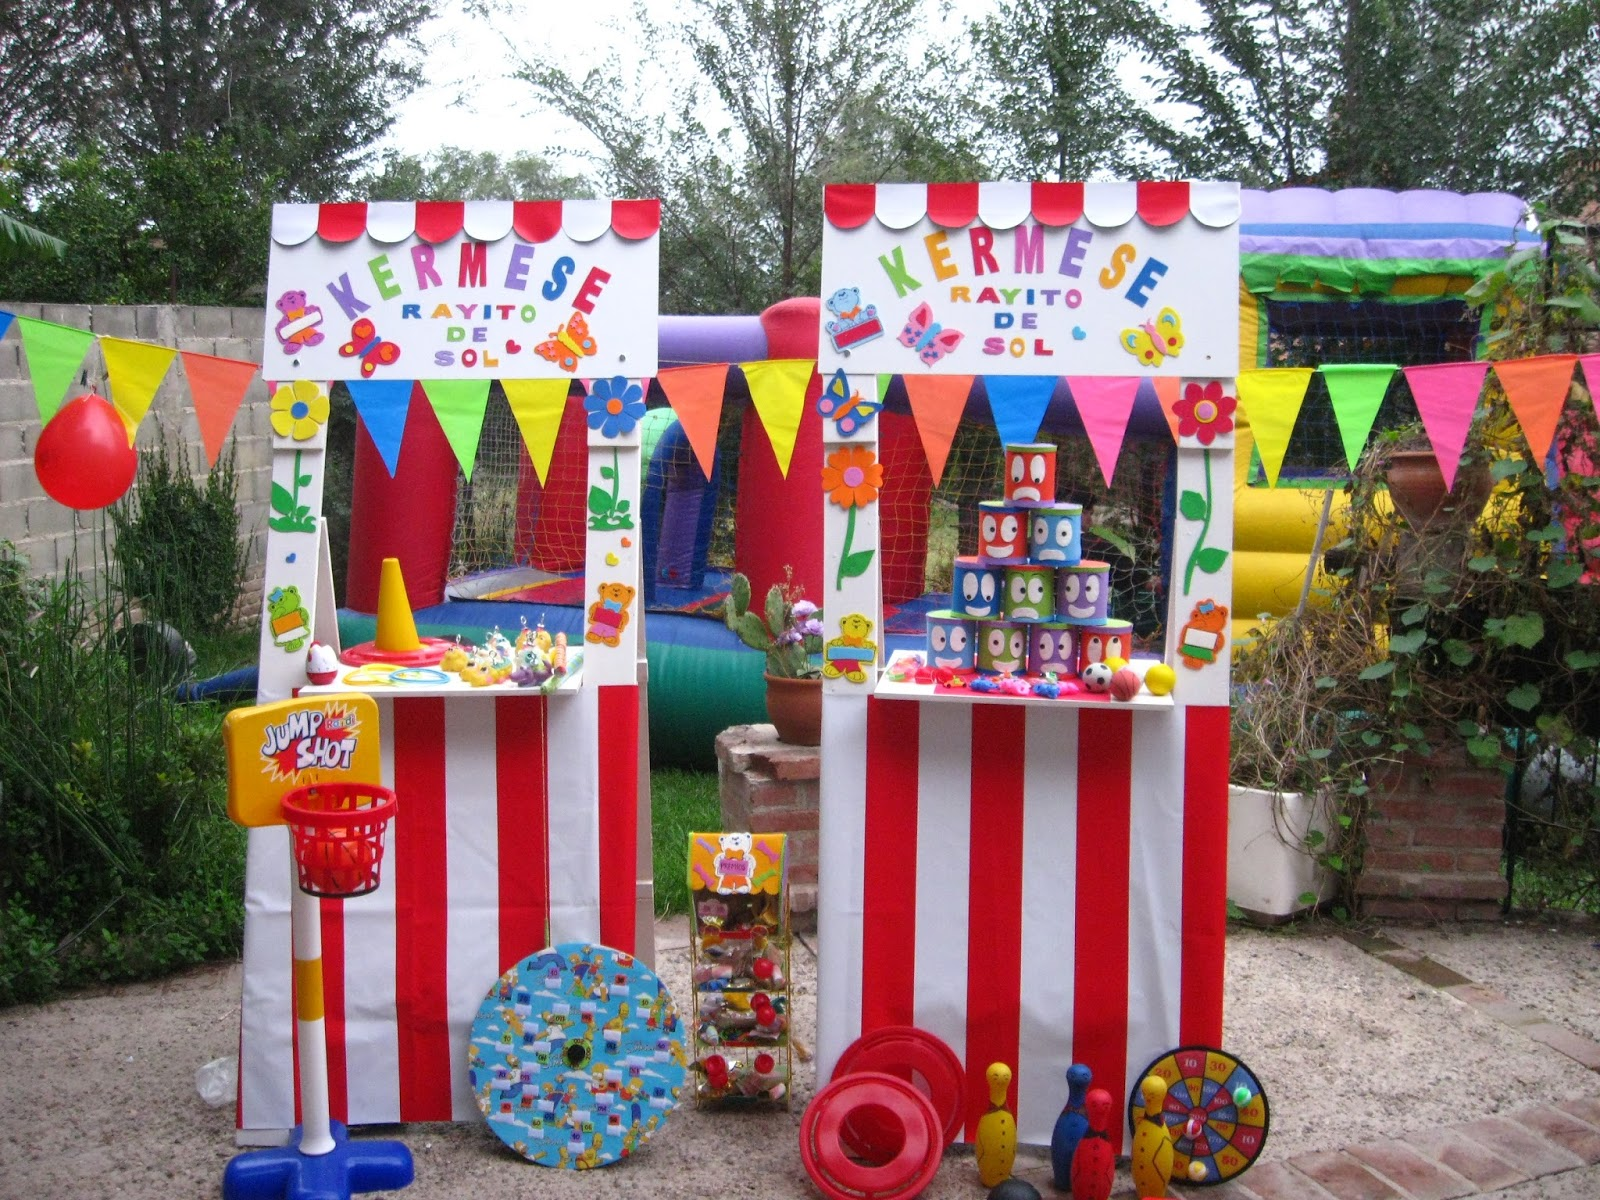 Juegos De Kermesse Para Jardin Inspiracion Para El Sokolvineyard Com